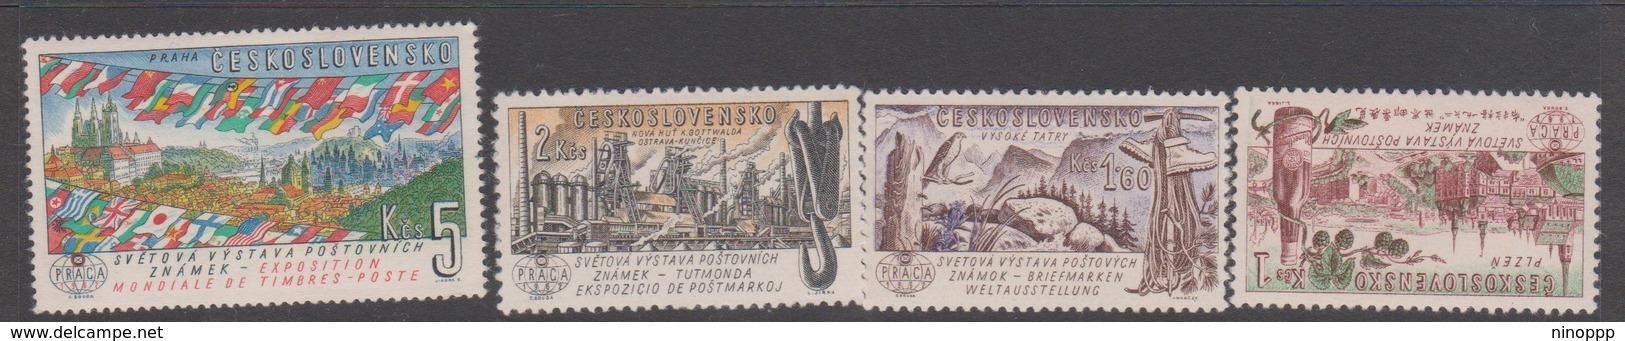 Czechoslovakia Scott 1070-79 1961 Praga 62 Philatelic Exhibition 3rd Issue 4 Stamps, Mint Never Hinged - Czechoslovakia